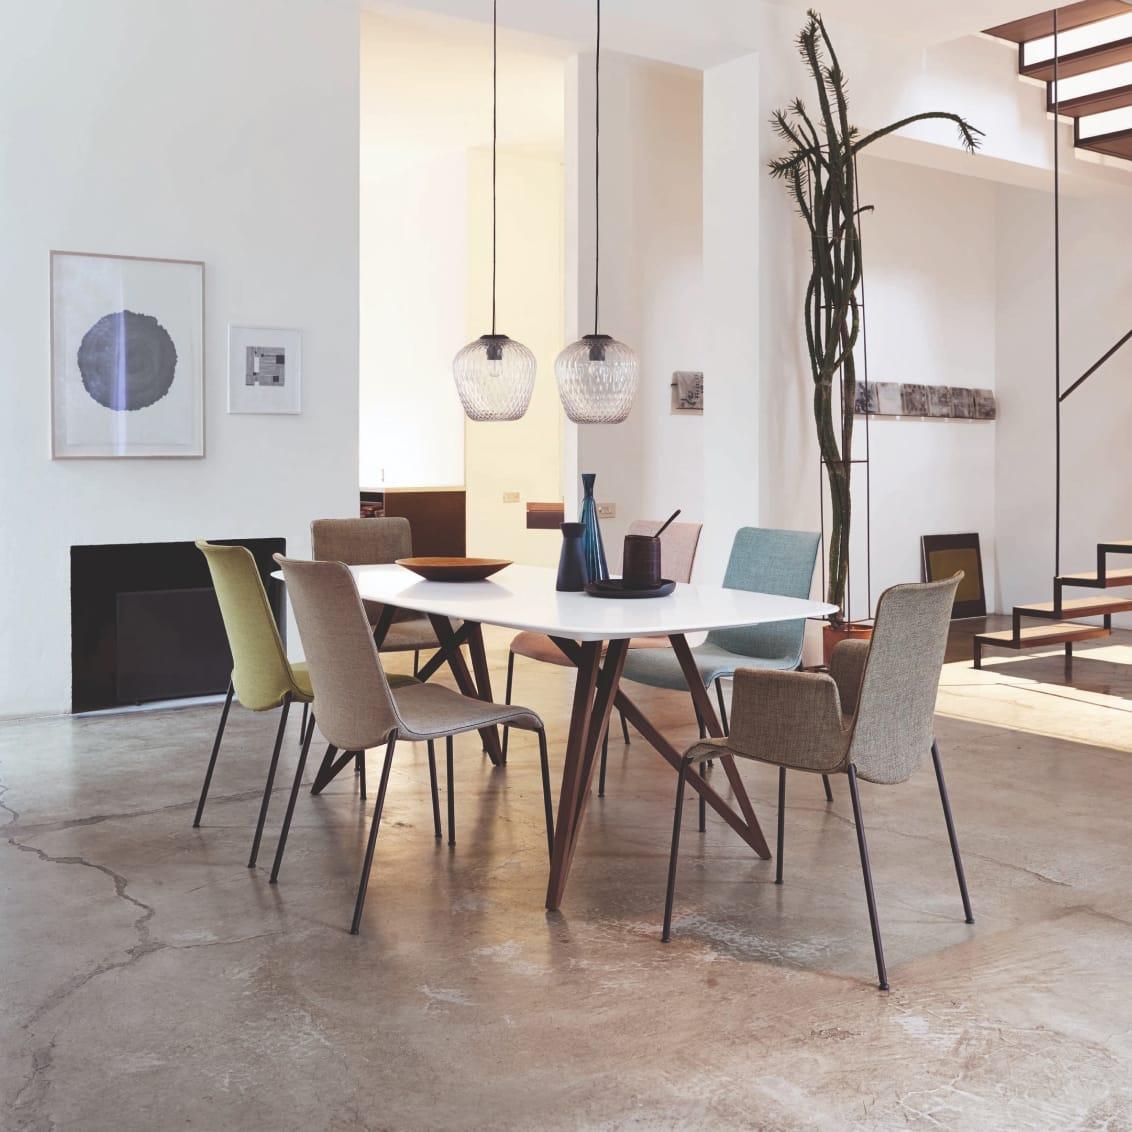 Seito Table. Design: Wolfgang C. R. Mezger. Liz Chair. Design: Claudio Bellini.